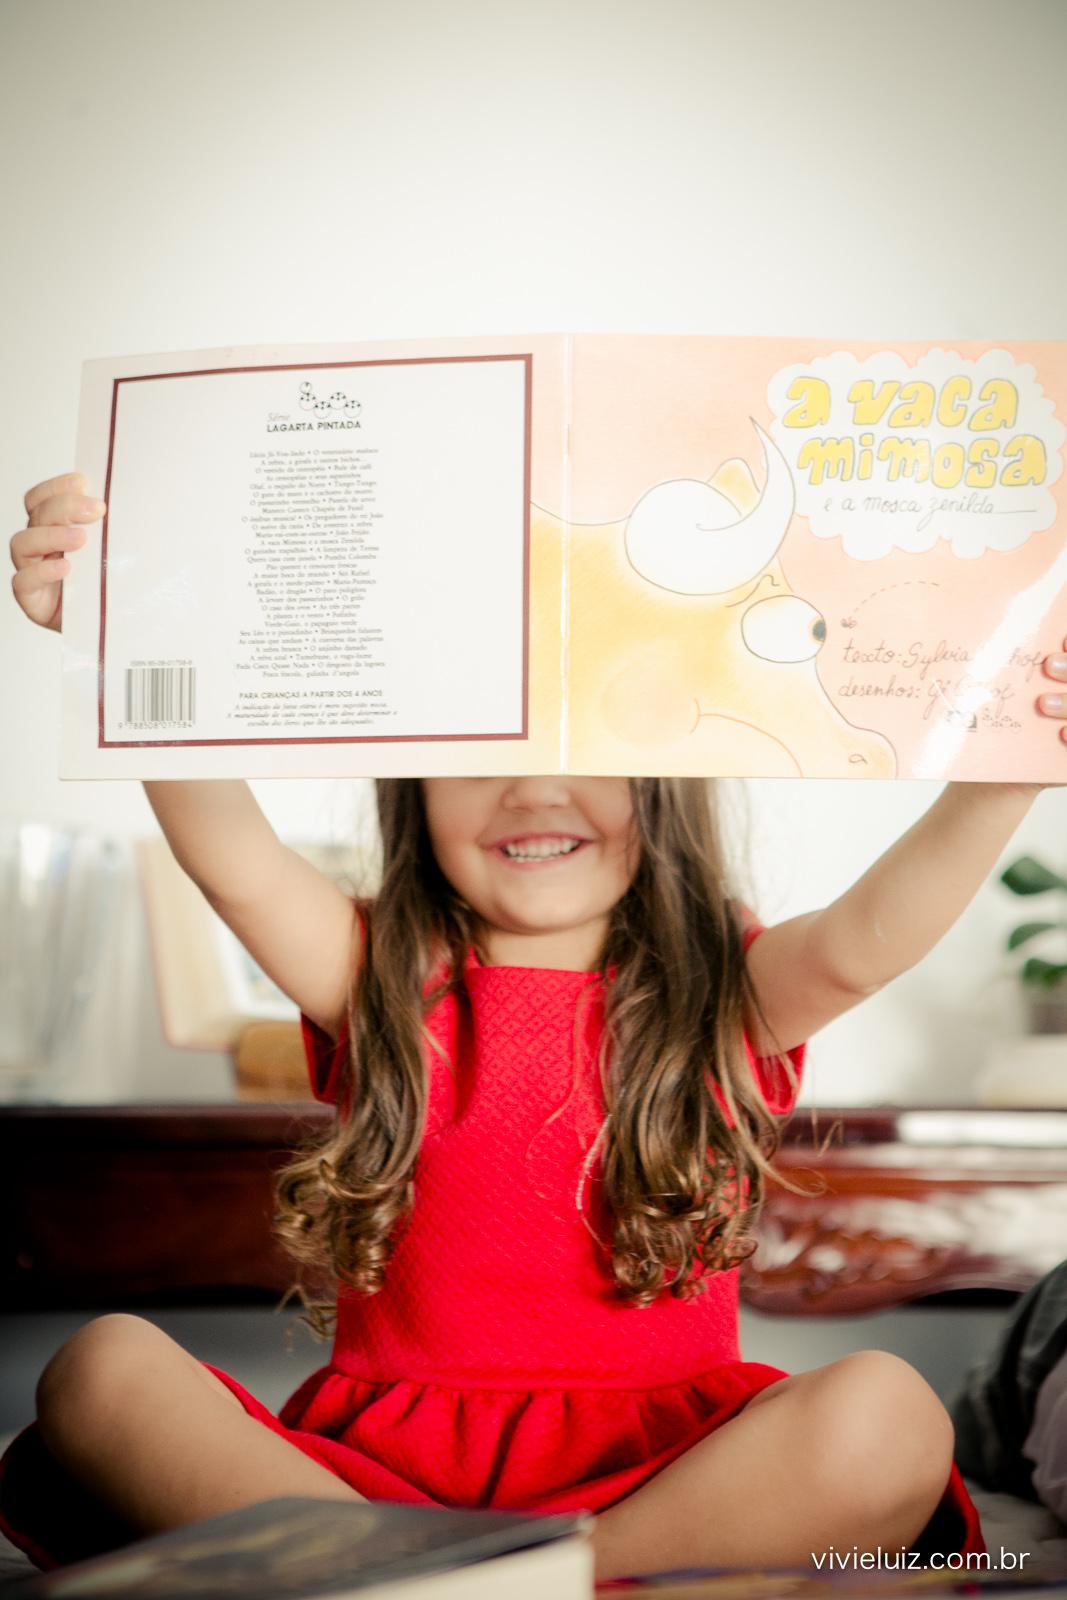 Menina levantando o livro e sorrindo